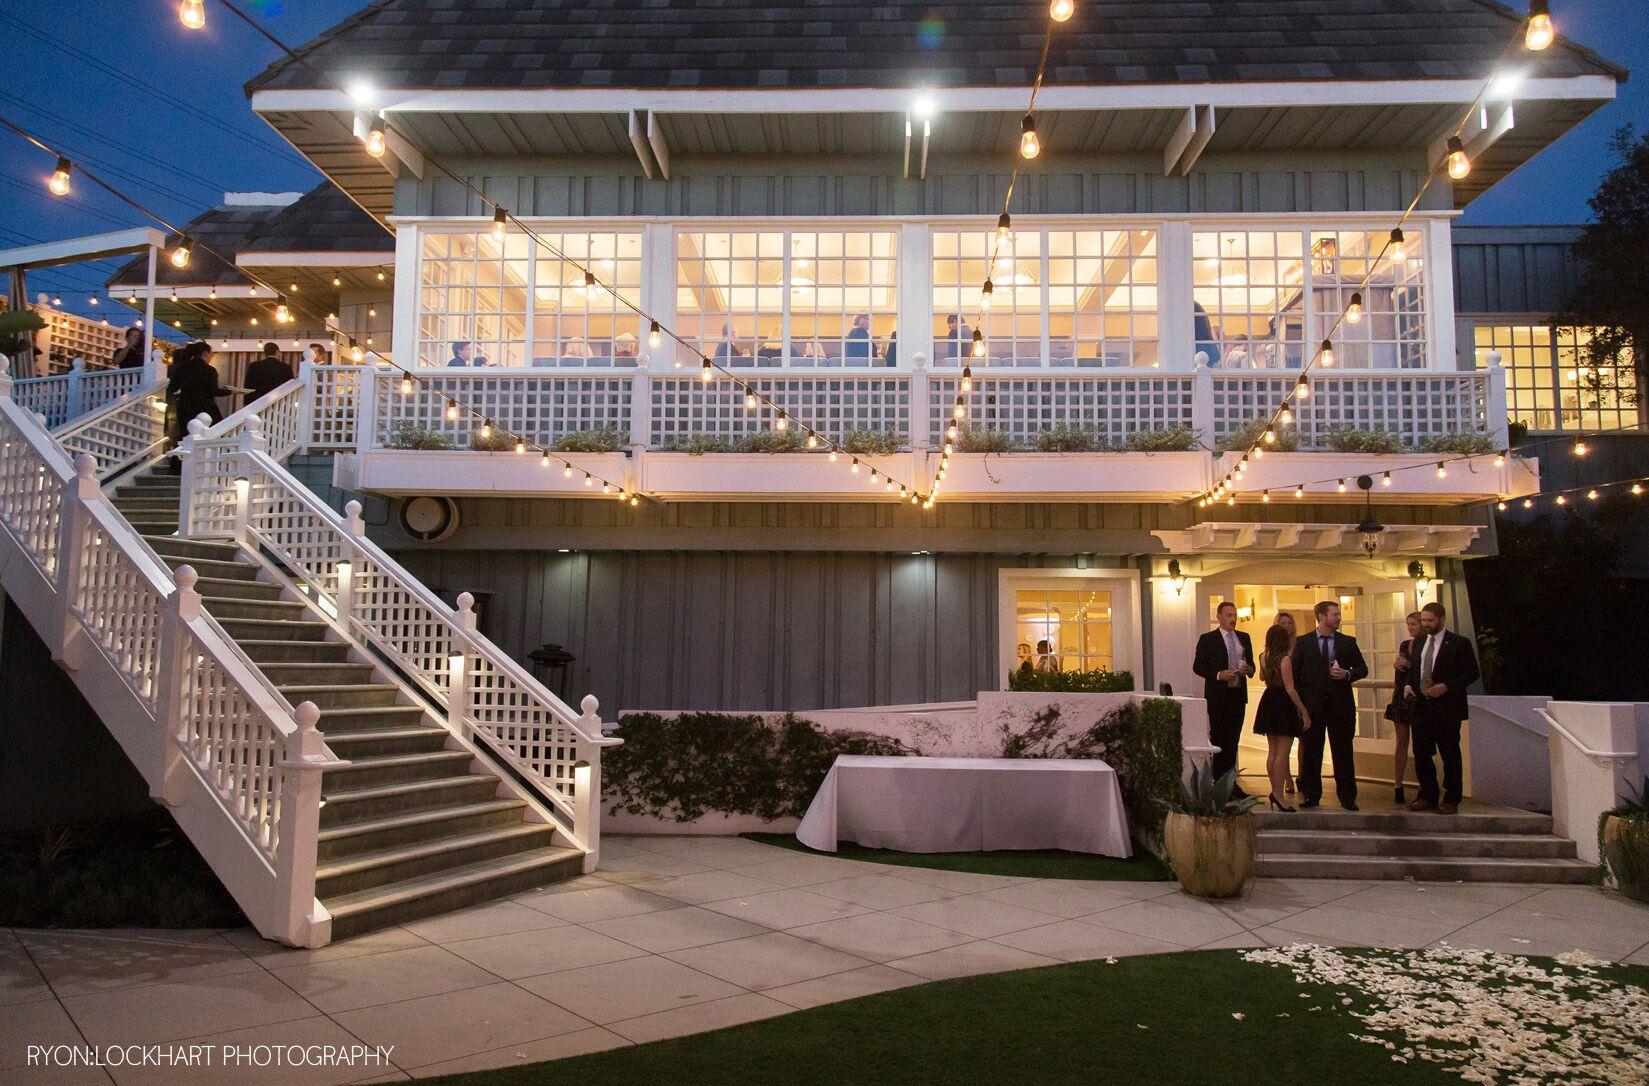 Diy weddings under 3000 - Diy Weddings Under 3000 15